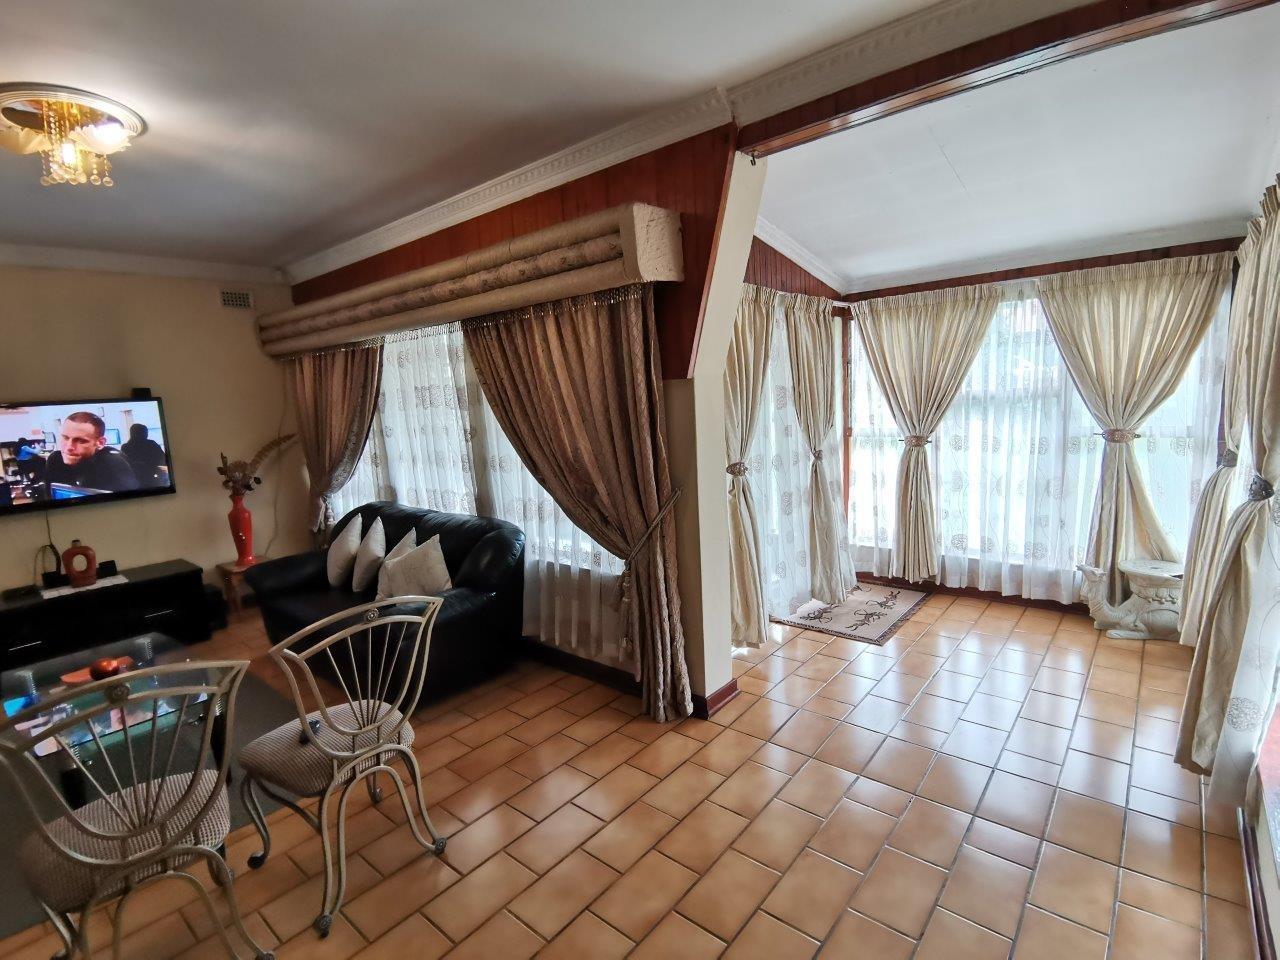 4 Bedroom House For Sale in Scottsville